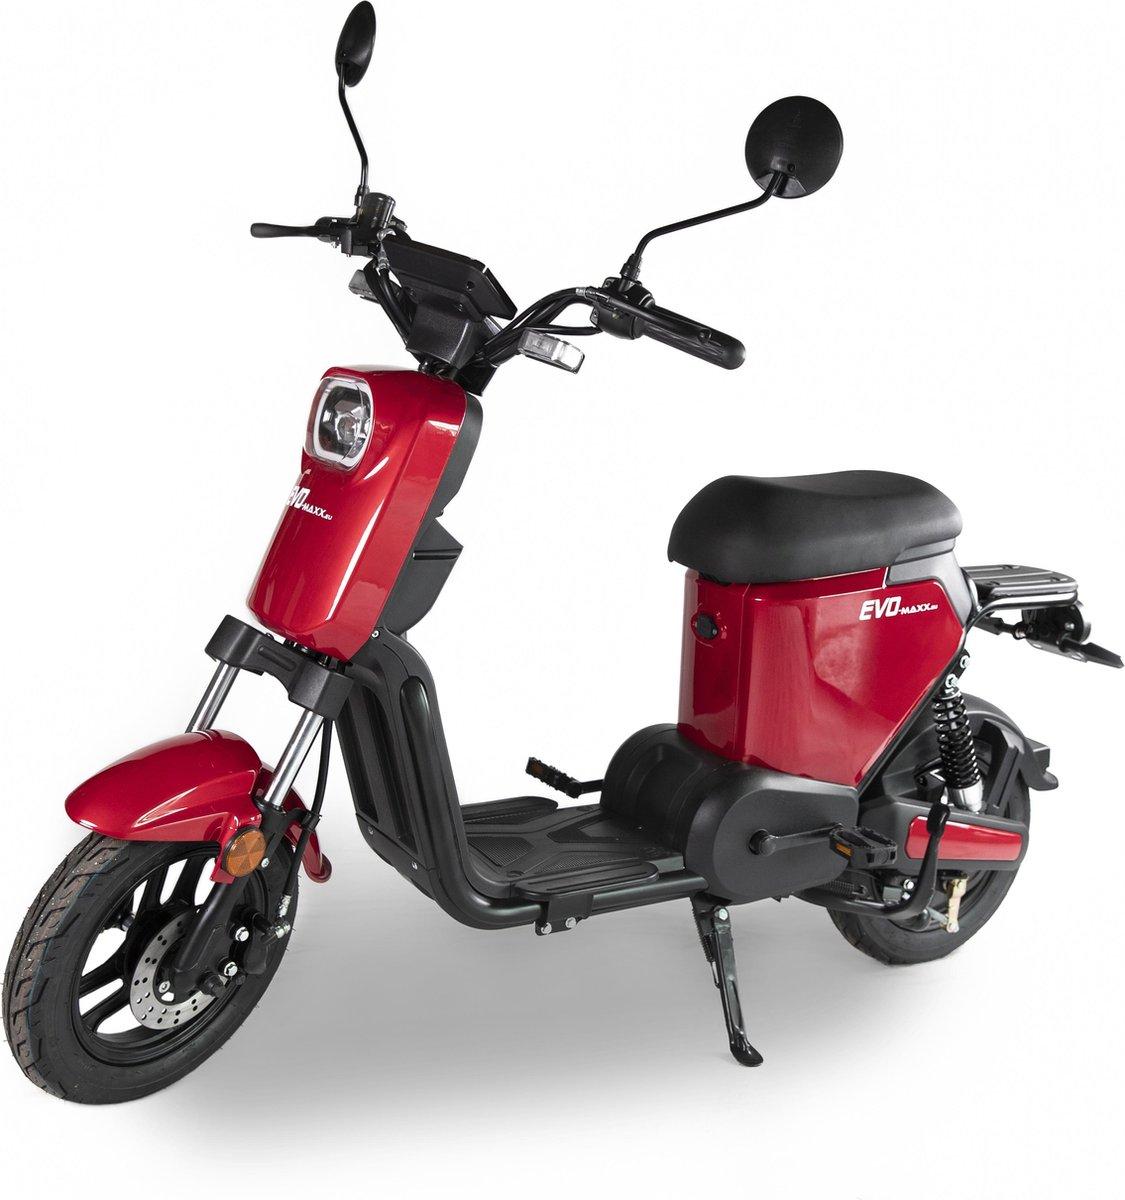 EVO-Maxx E-Line Wine Red + uitneembare Lithium accu, actieradius 45-70km*